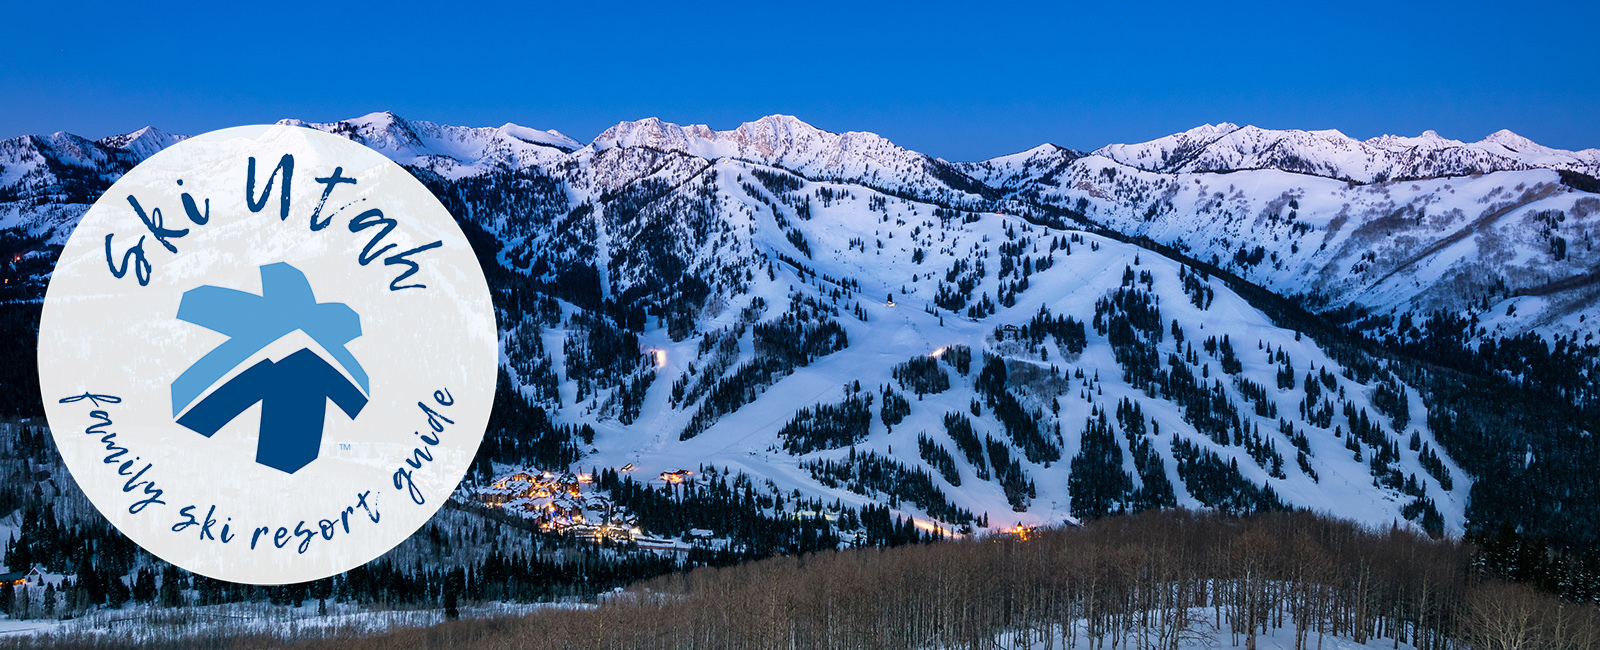 Family Ski Resort Guide | Solitude Mountain Resort